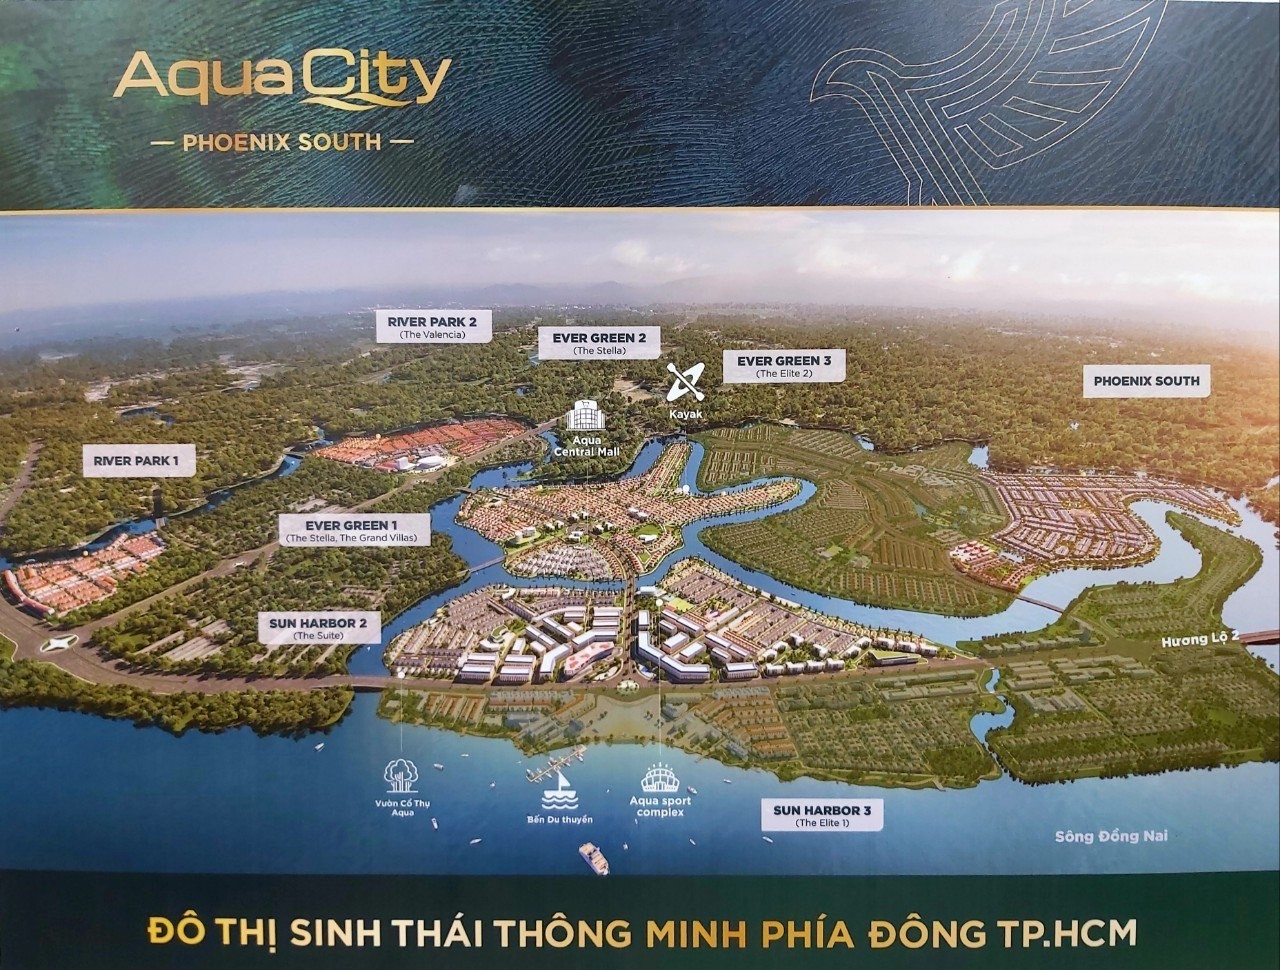 phoi canh phan khu phoenix south aqua city